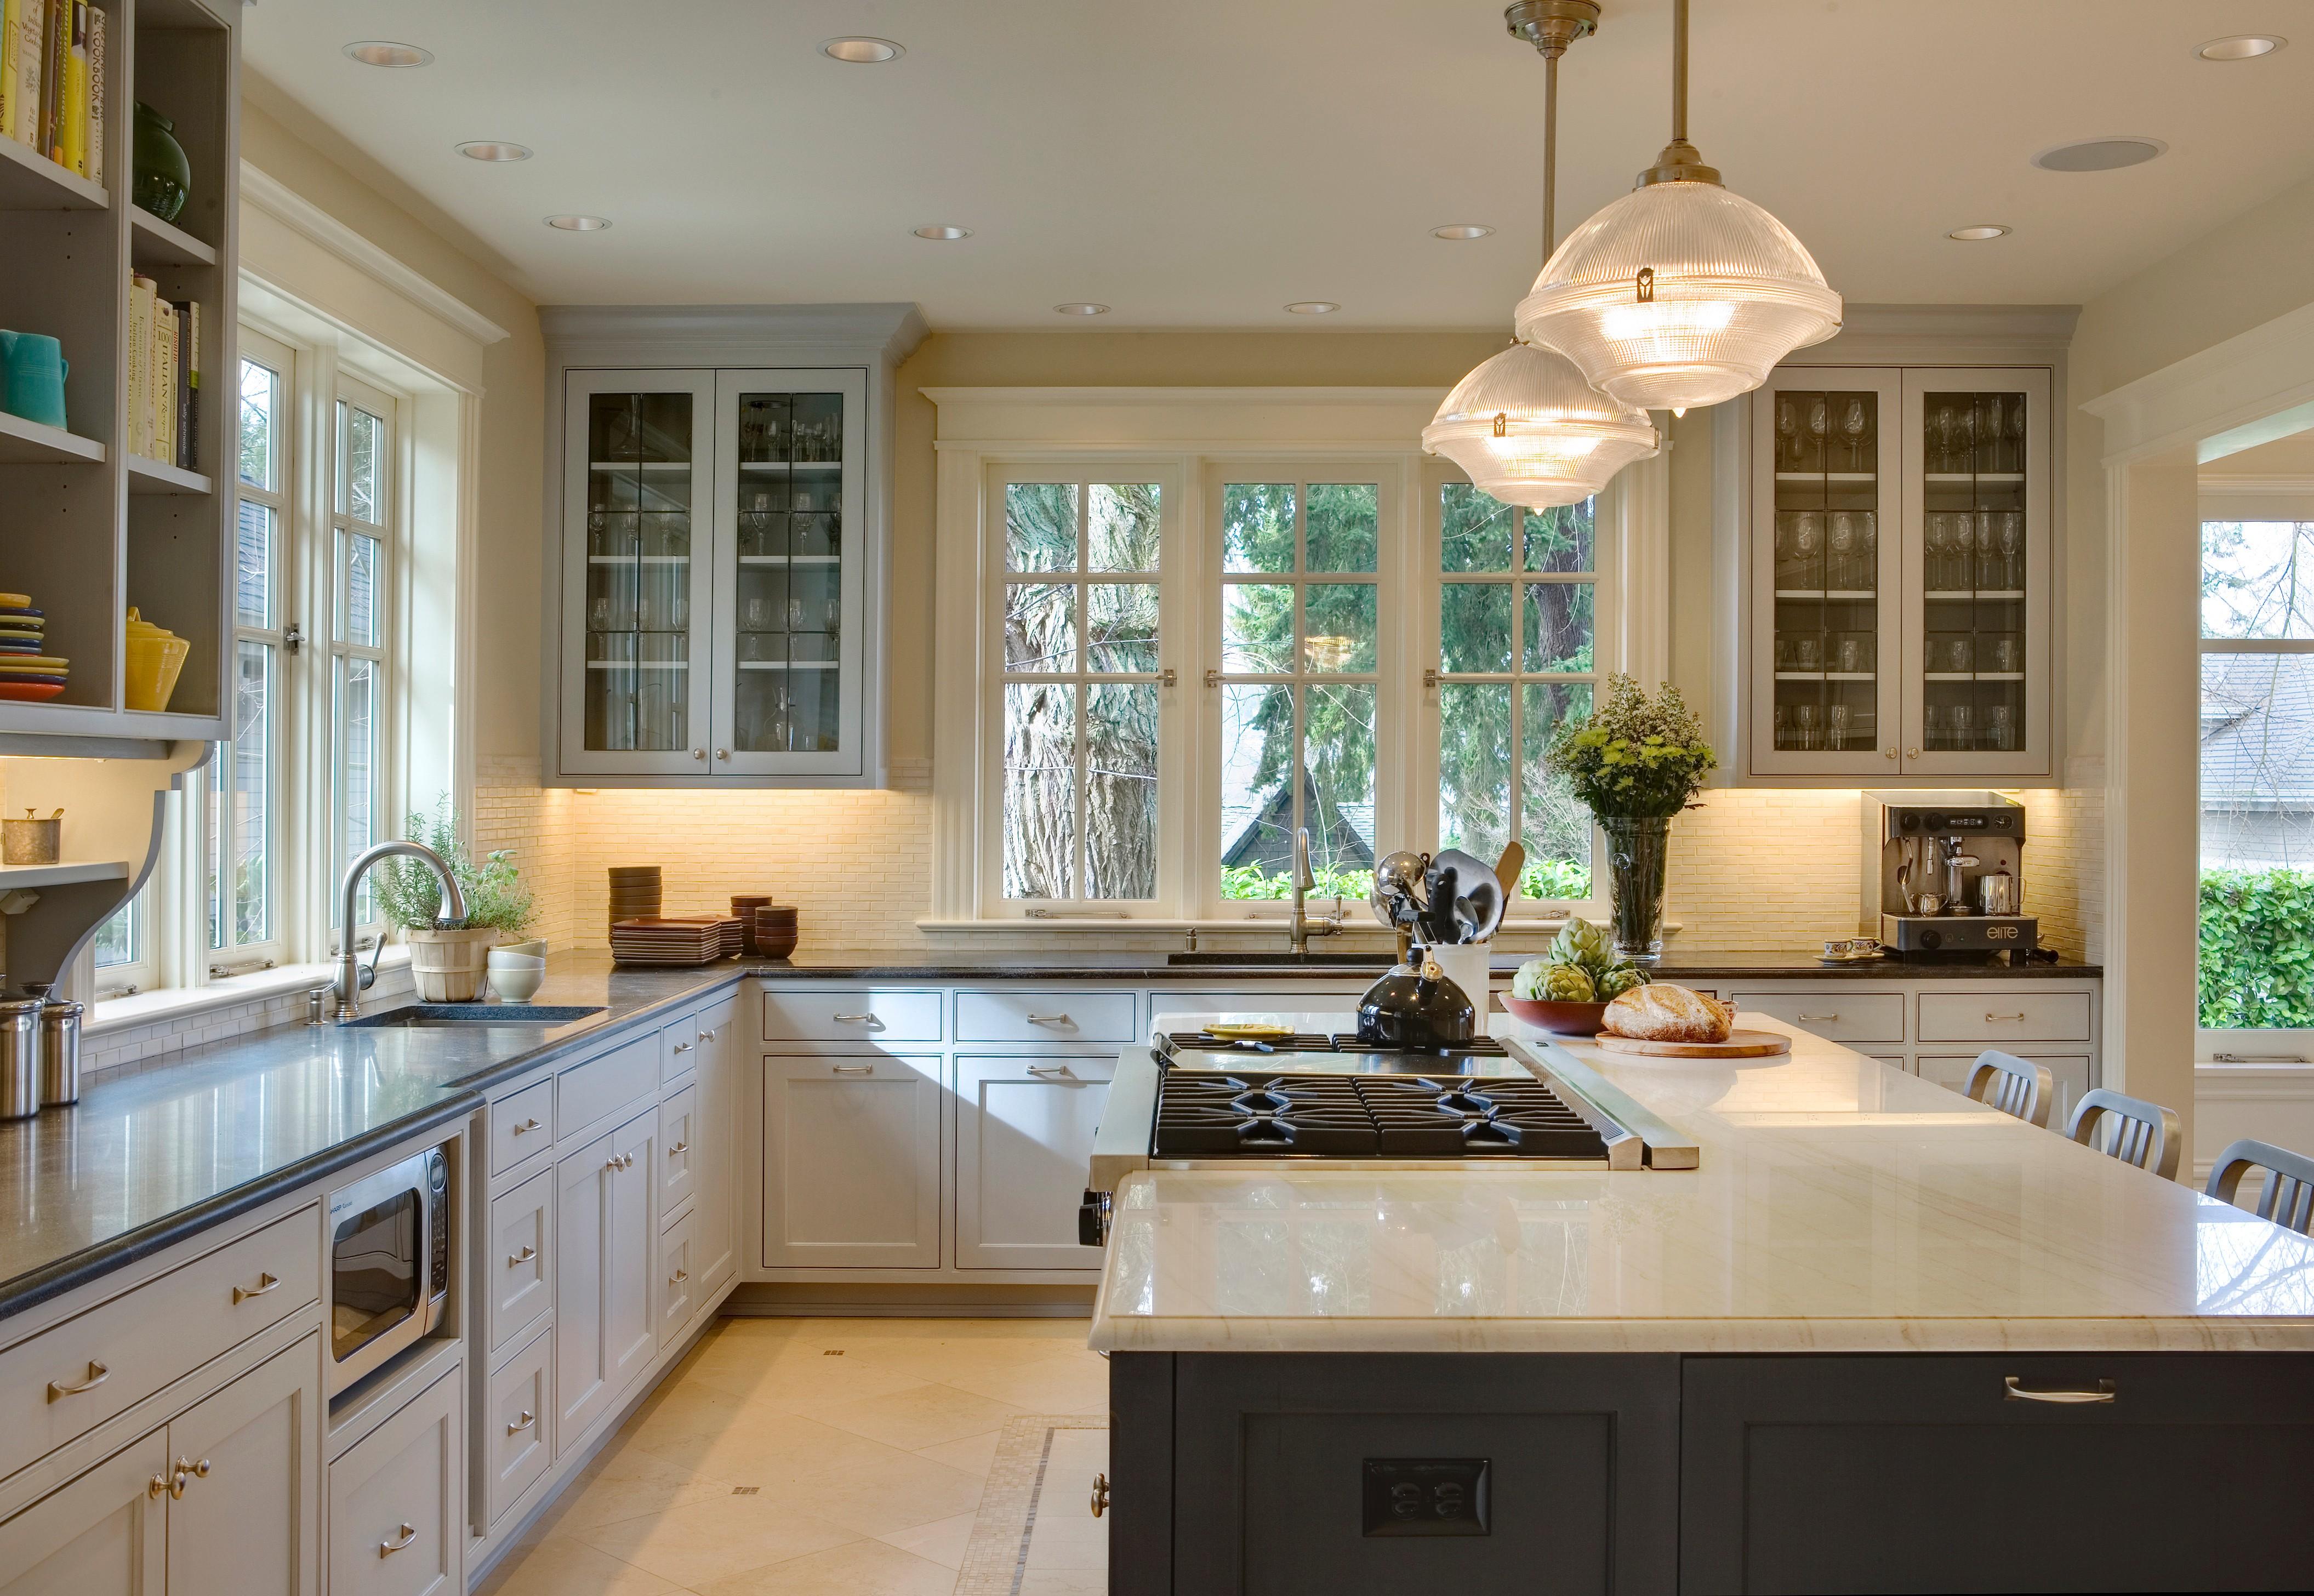 Perfect Windows Under Kitchen Cabinets Ef58 Roccommunity